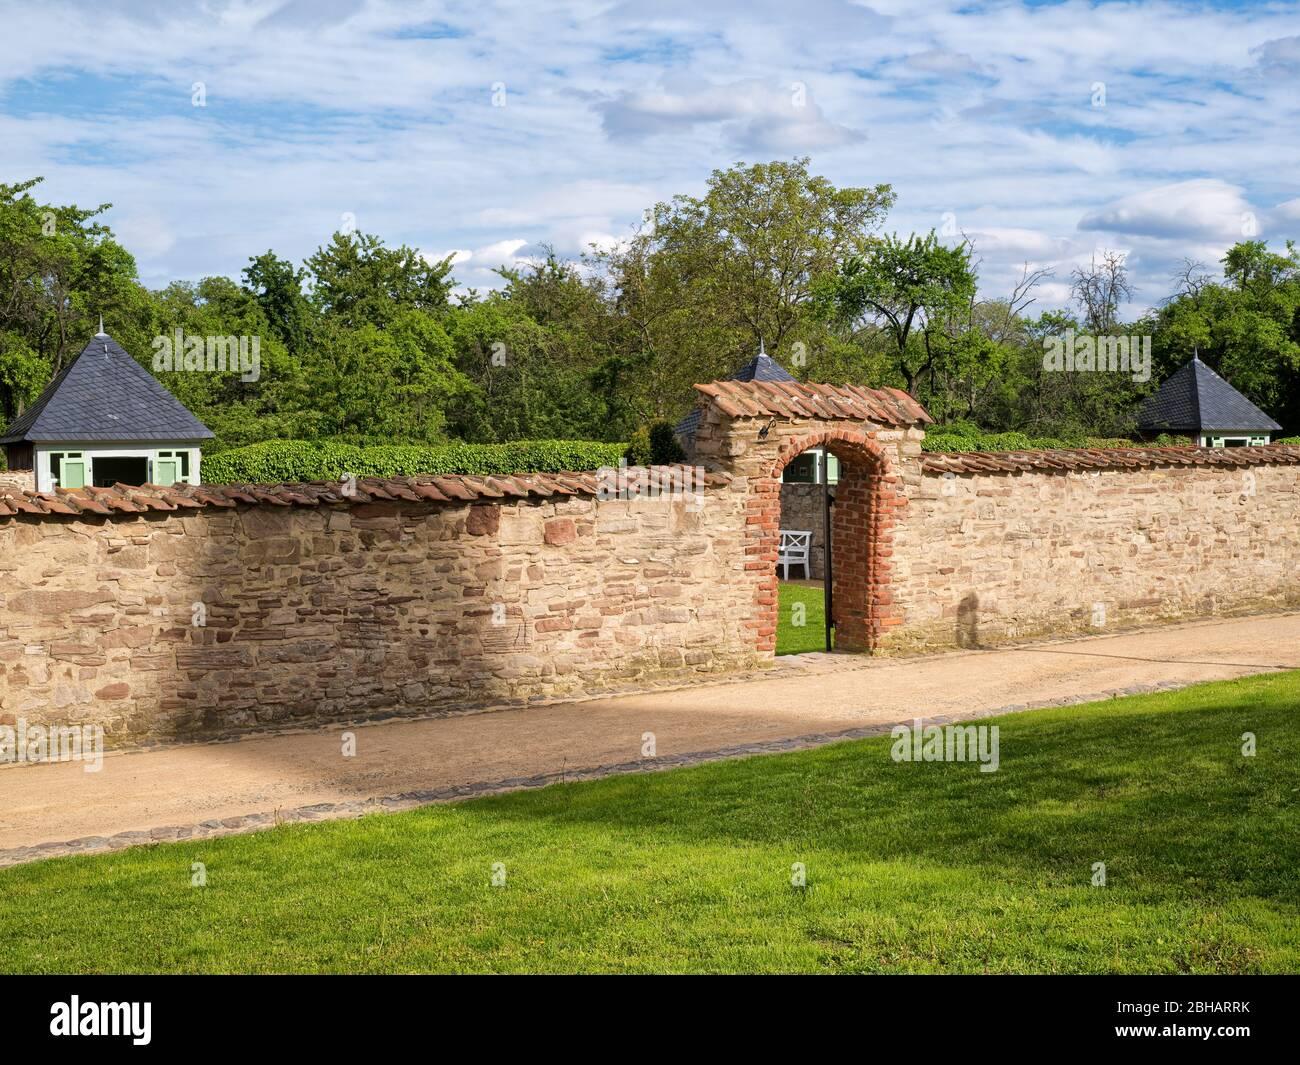 Europe, Germany, Saxony-Anhalt, Ilsenburg, Drübeck Abbey, Benedictine Monastery St. Vitus, 10th century, cloister garden with cloister wall Stock Photo